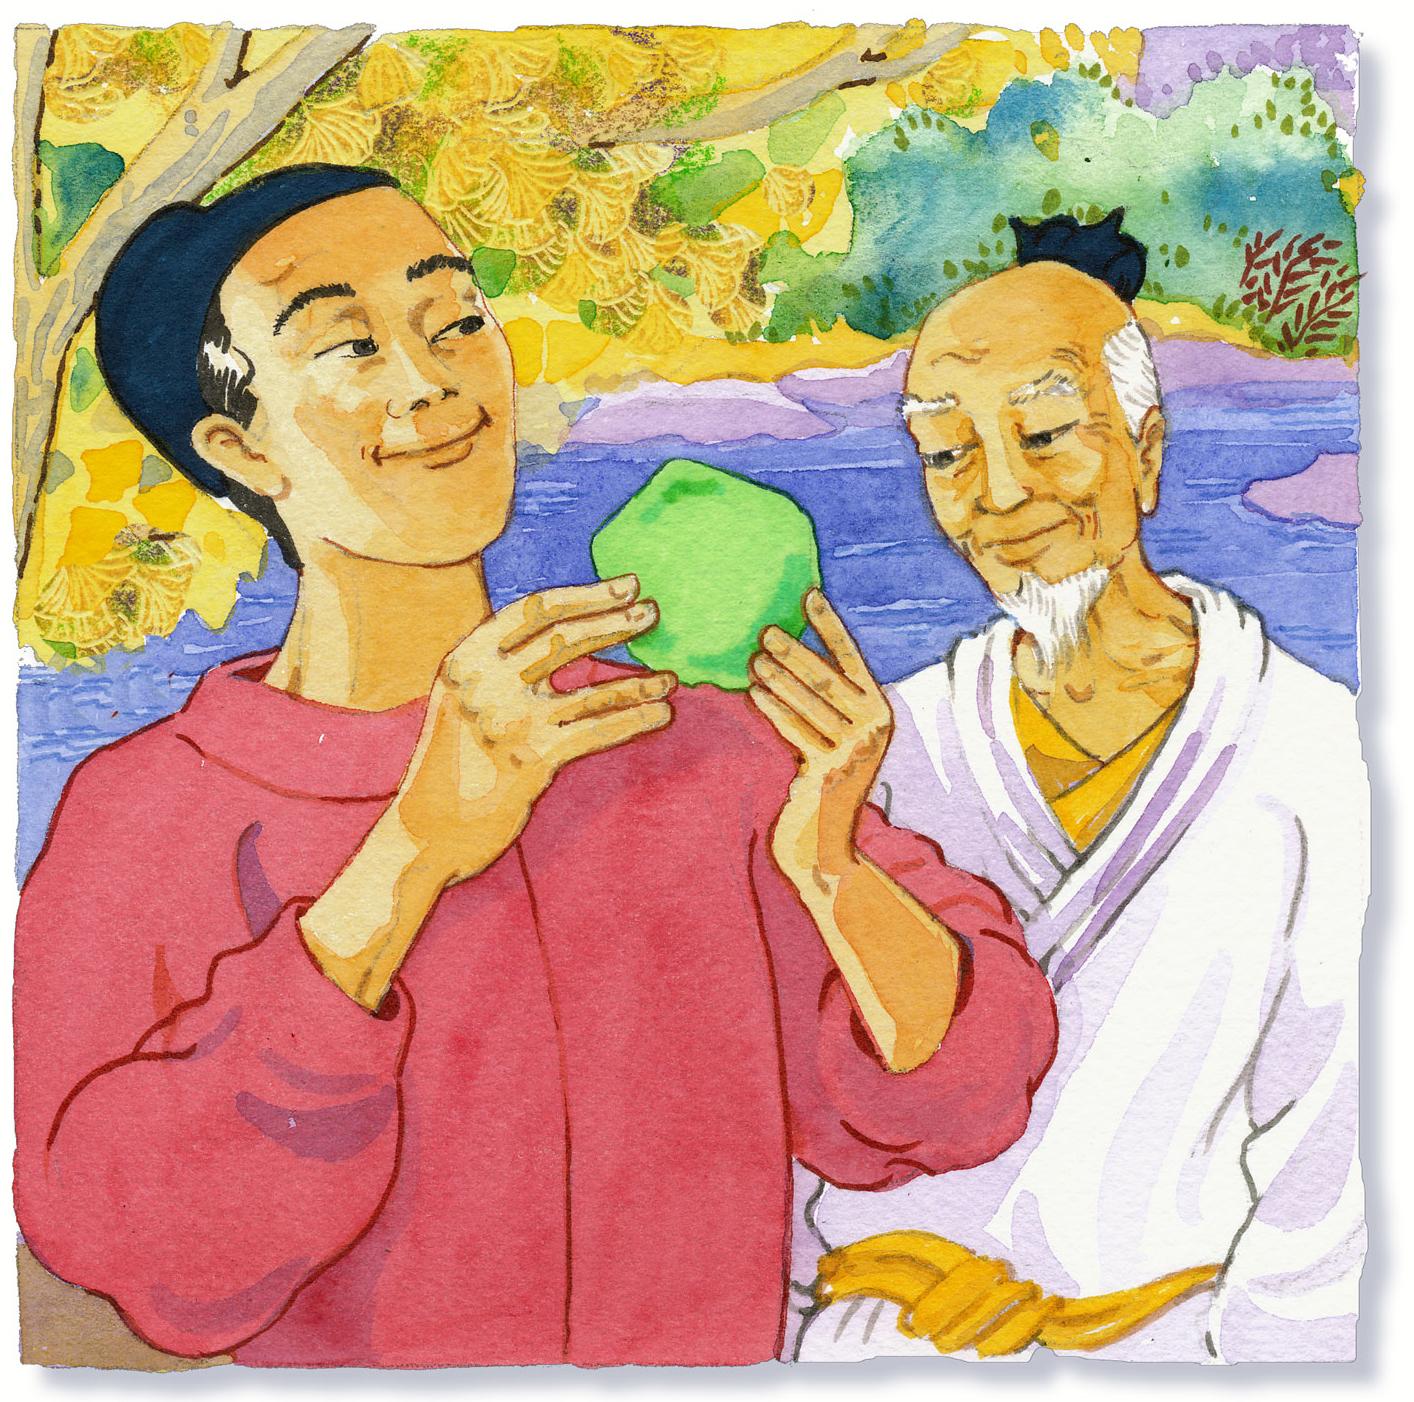 Chinese folktale